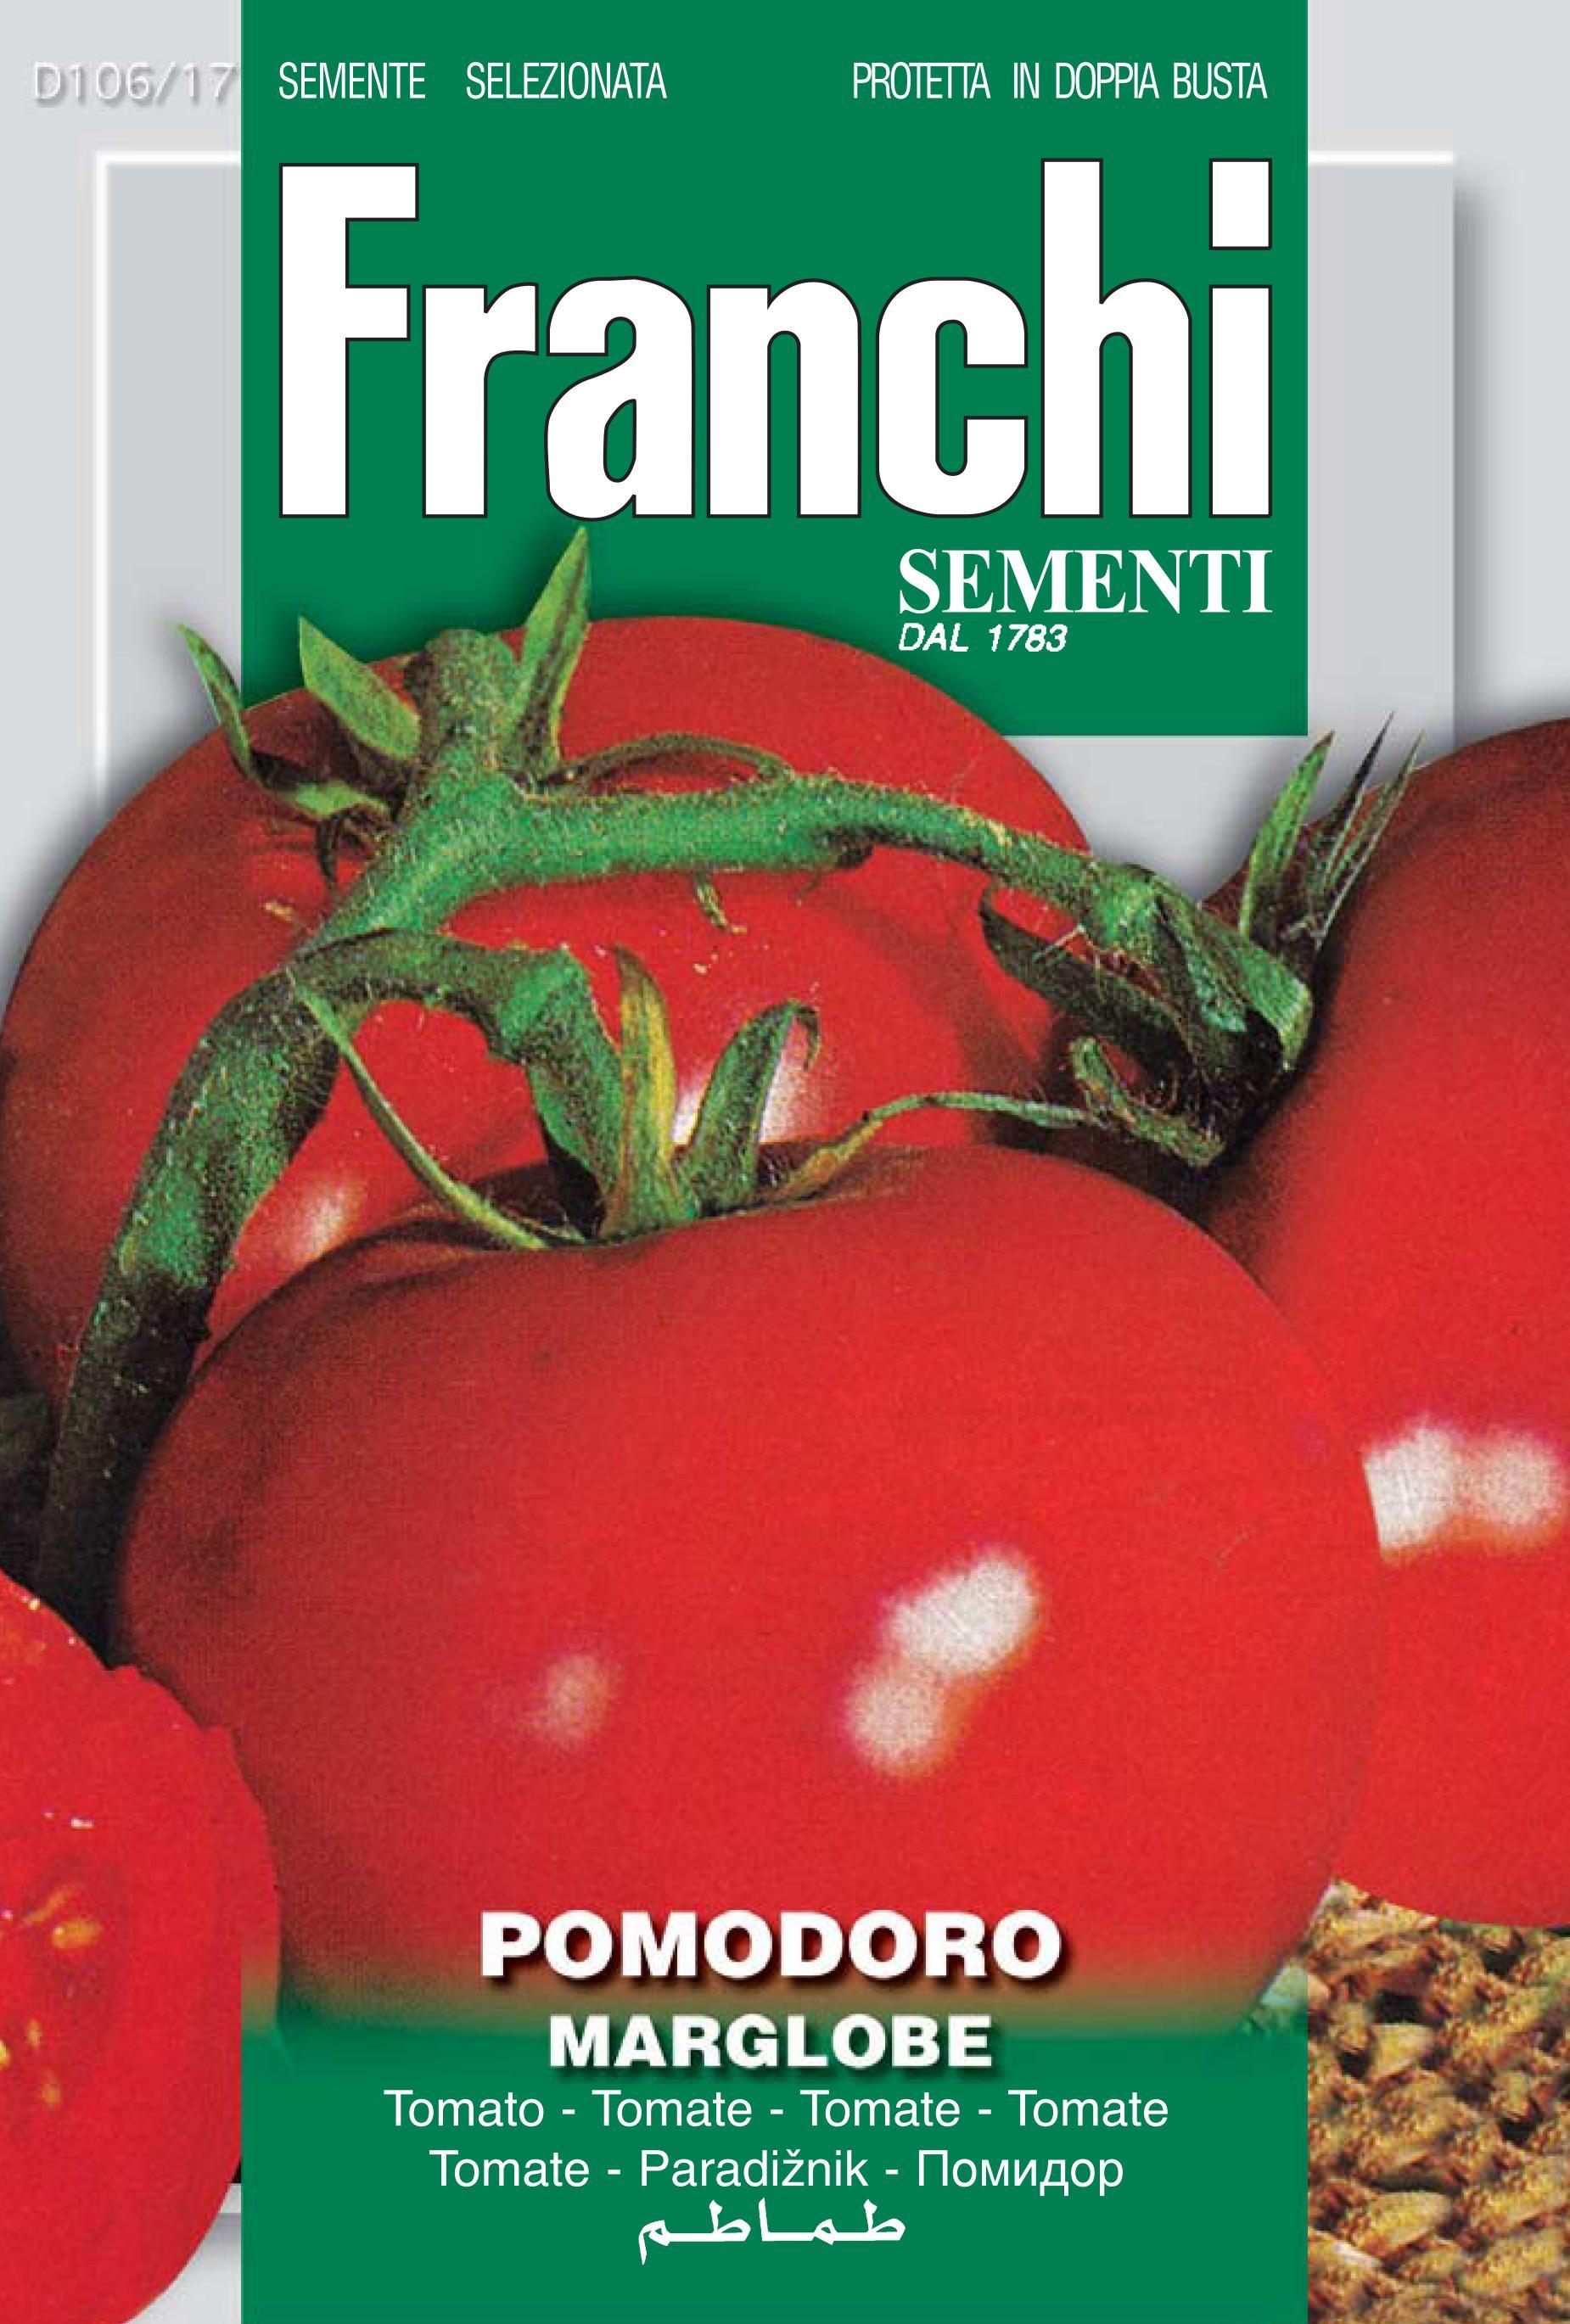 Tomato Marglobe - Save 46p